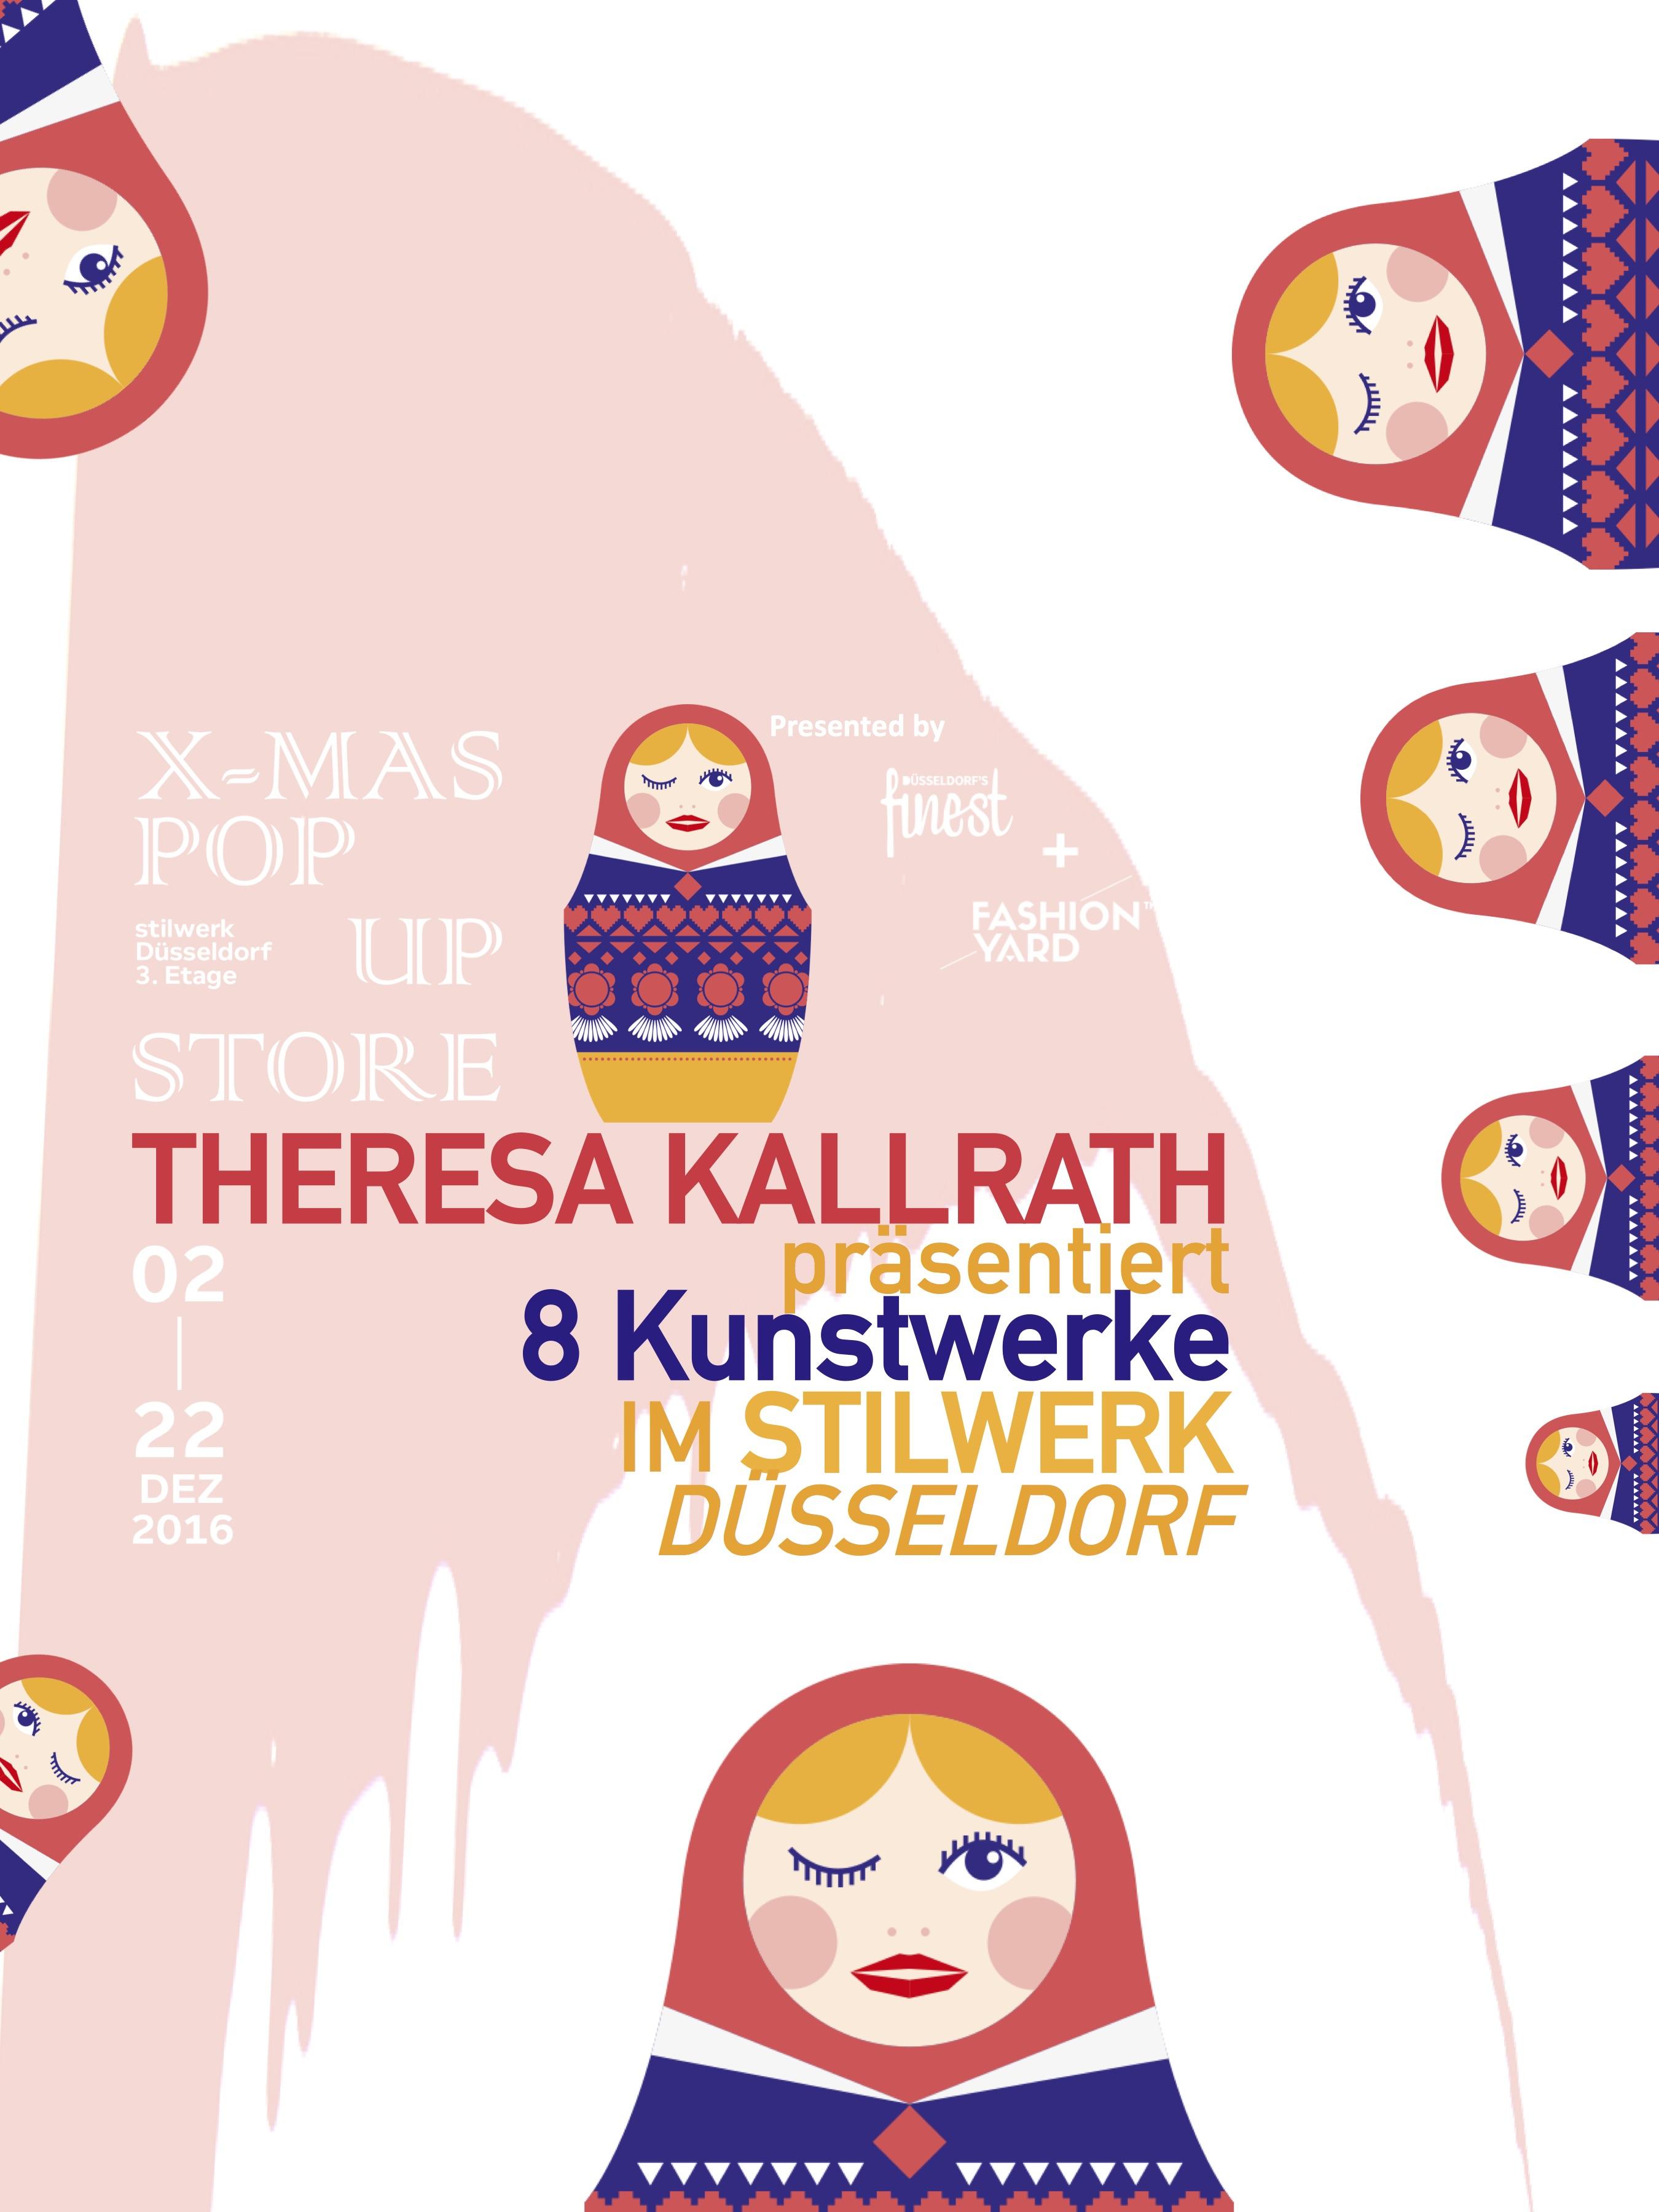 STILWERK DÜSSELDORF_FINEST _X-MAS POP UP STORE Theresa Kallrath